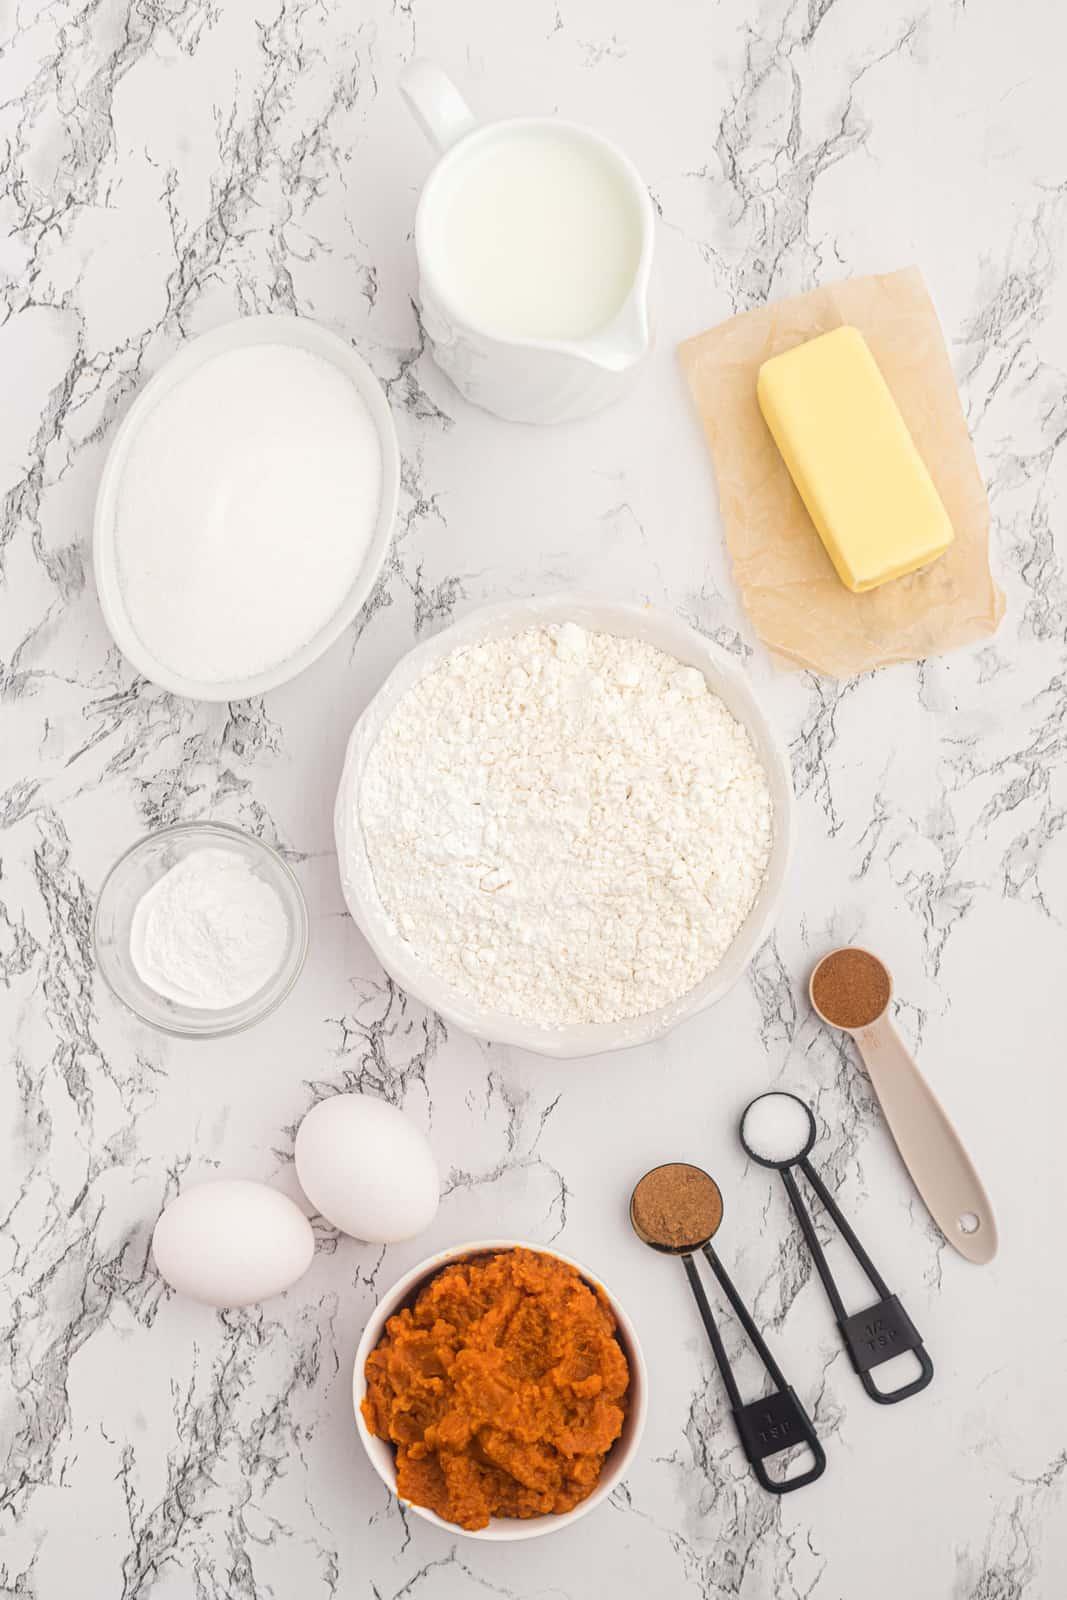 Ingredients needed to make Pumpkin Cupcakes